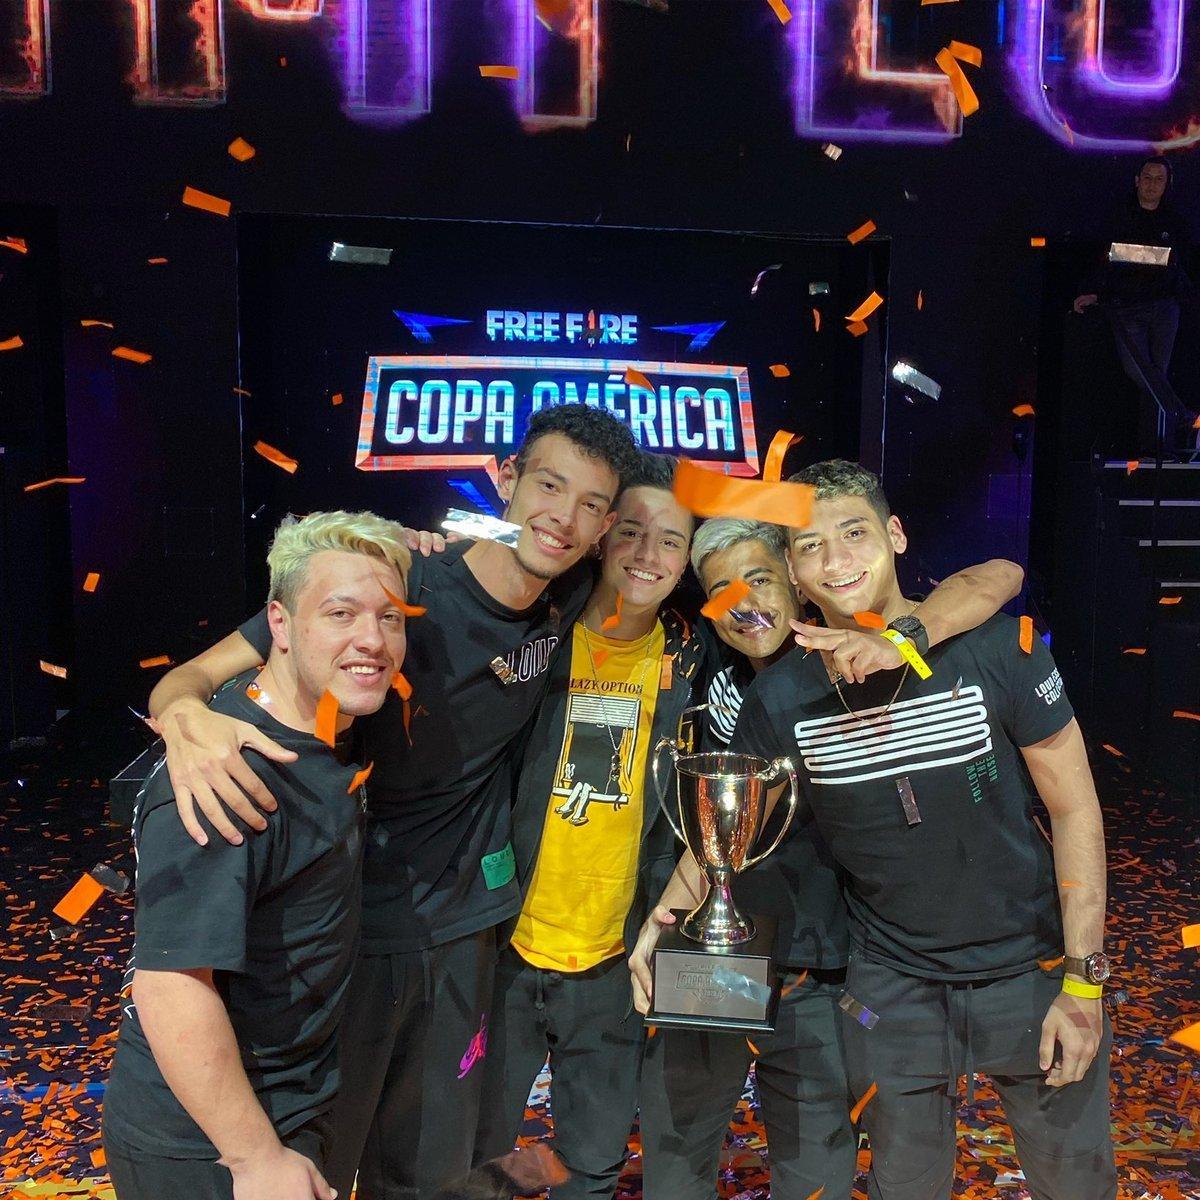 LOUD Free Fire: Line-up campeã da Copa America de 2020 se desfaz